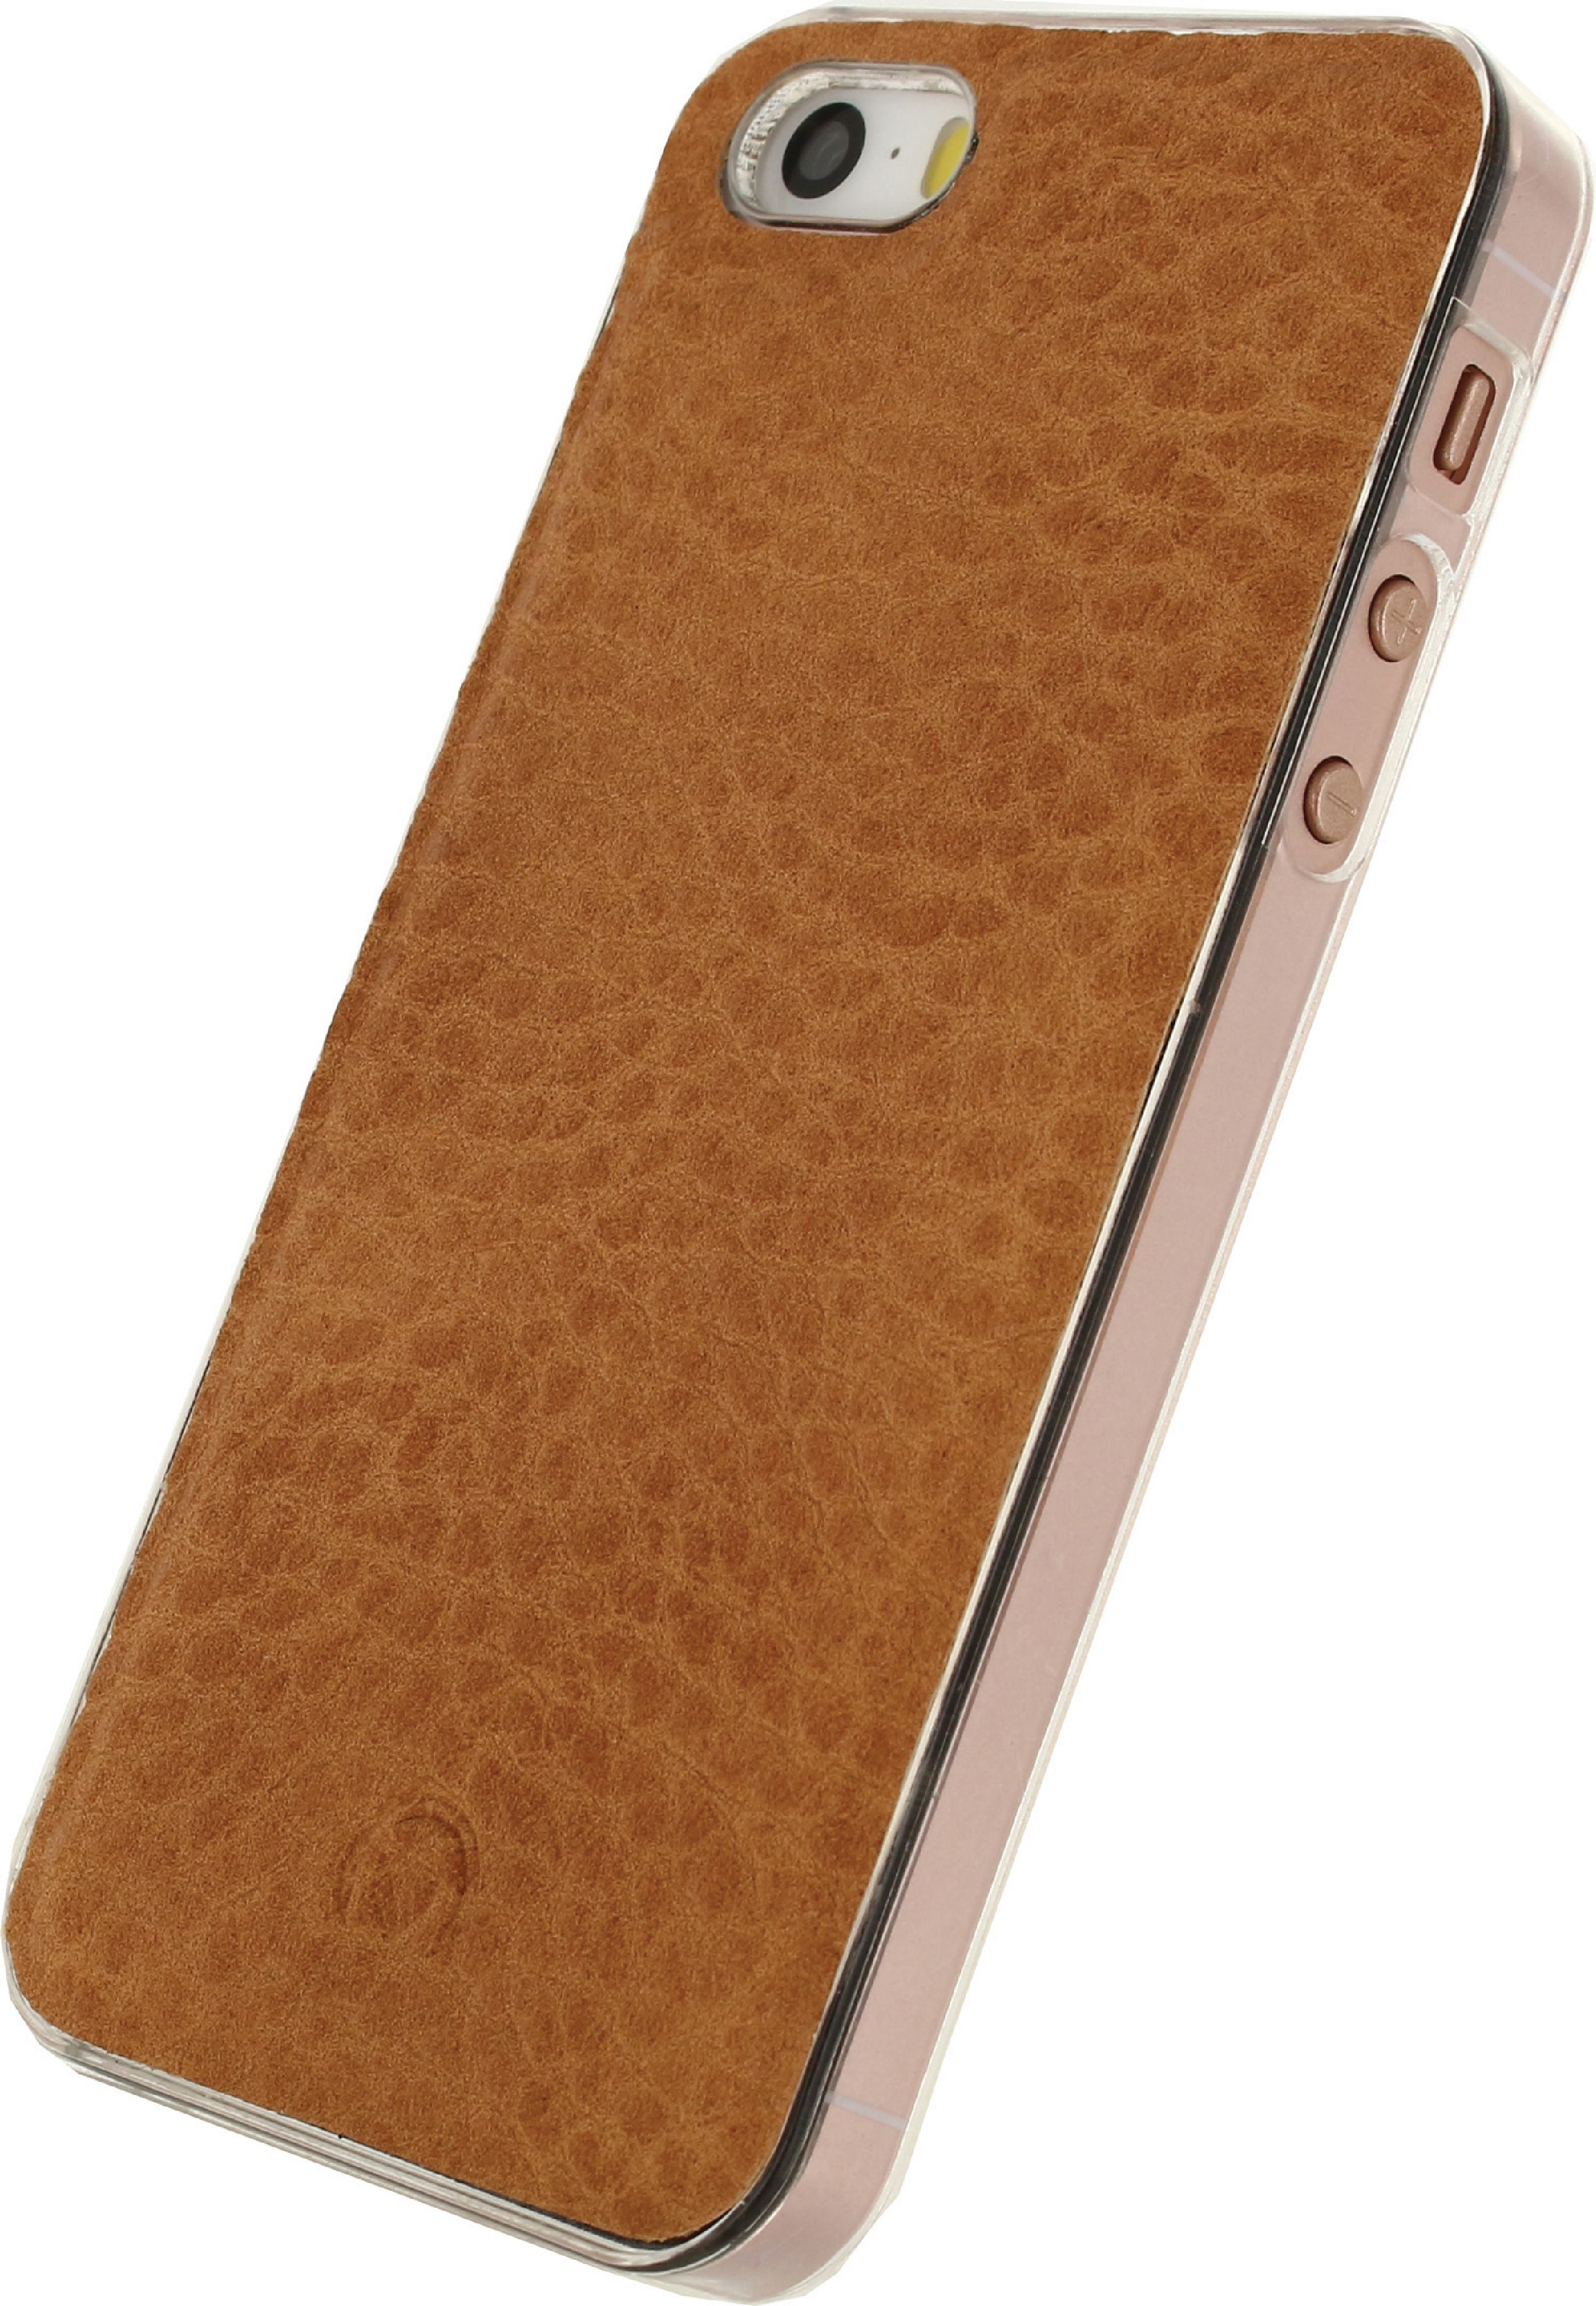 Image of   Telefon Aftageligt Lommebogsetui Apple iPhone 5 / 5s / SE Brun